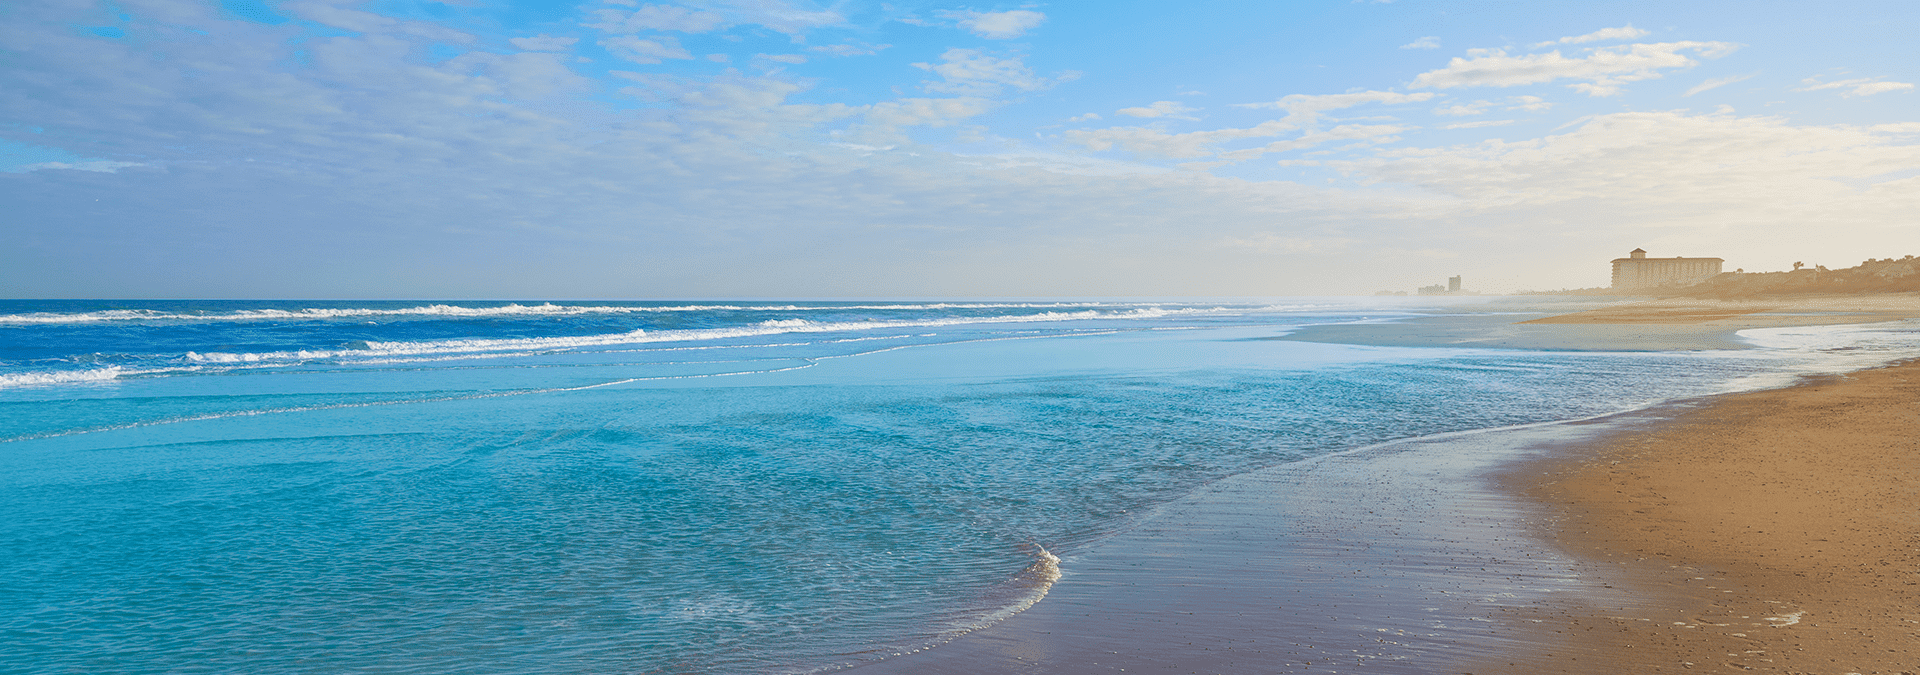 the shoreline of atlantic beach florida